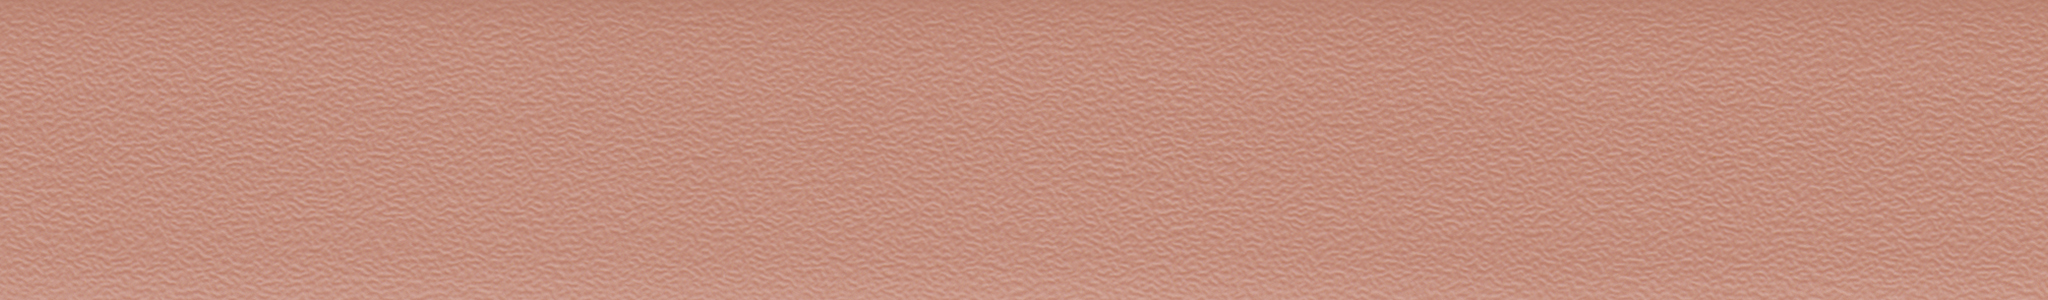 HU 14317 ABS Edge Orange Pearl 101